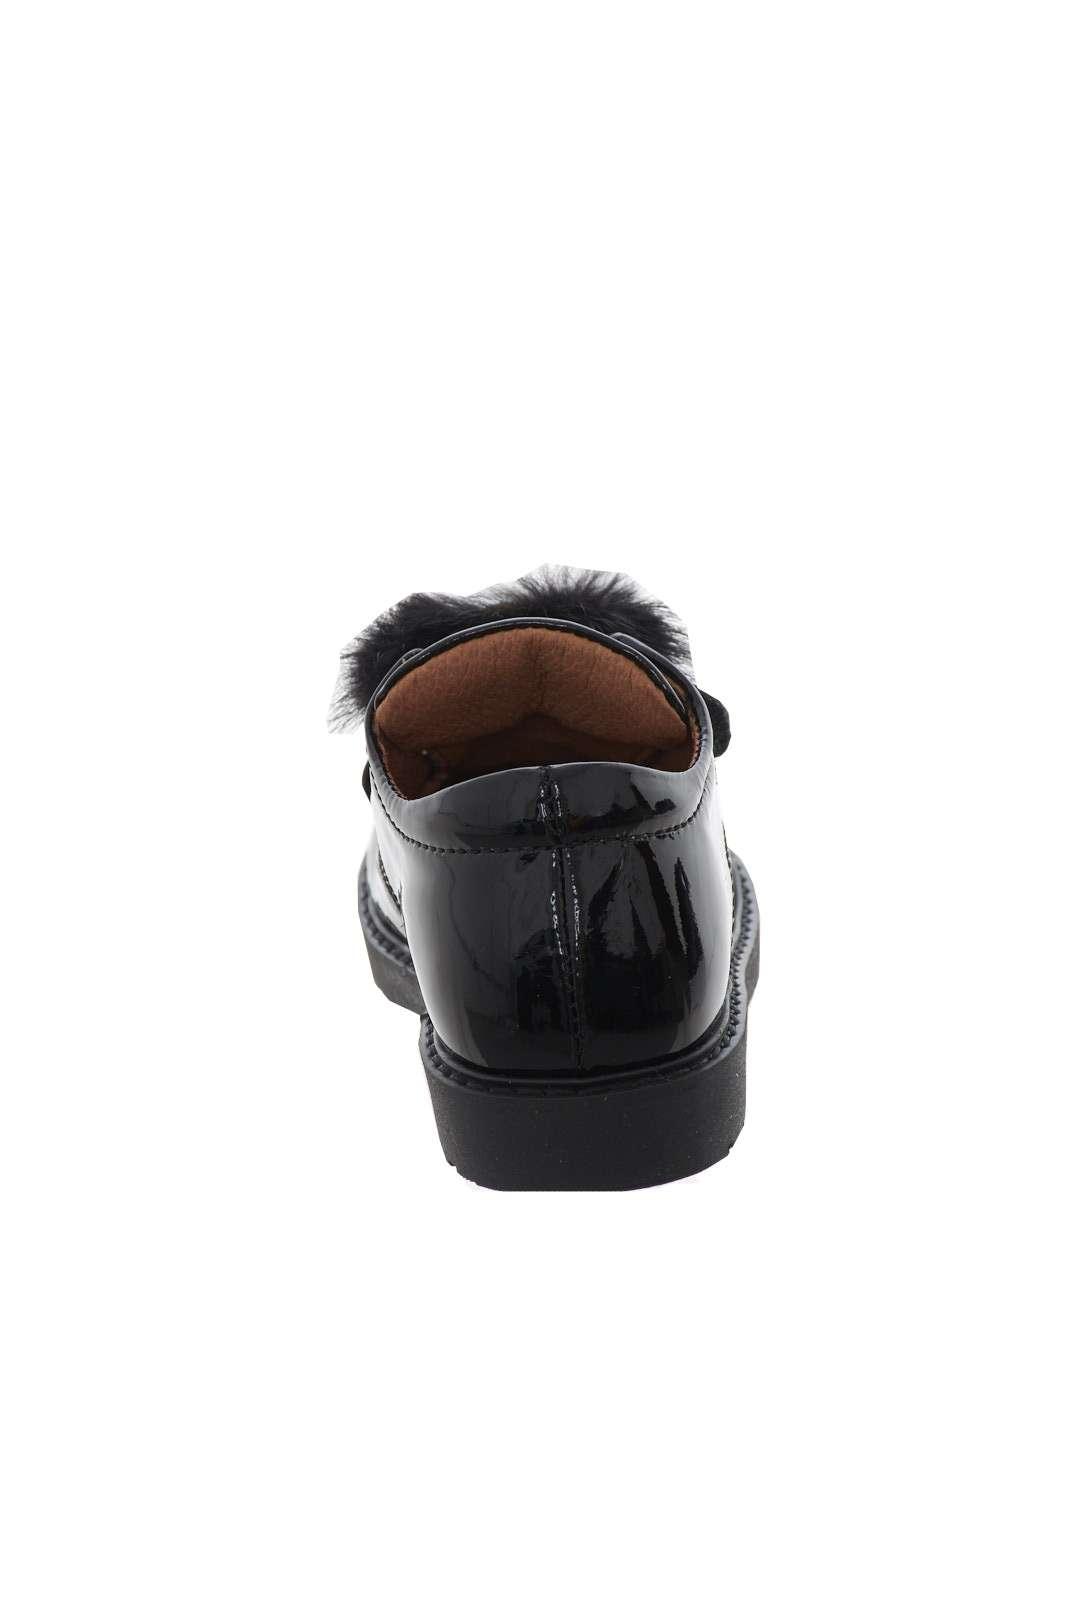 https://www.parmax.com/media/catalog/product/A/I/AI-outlet_parmax-scarpe-bambina-Walkey-Piccoli-Passi-Y1a40150-C.jpg